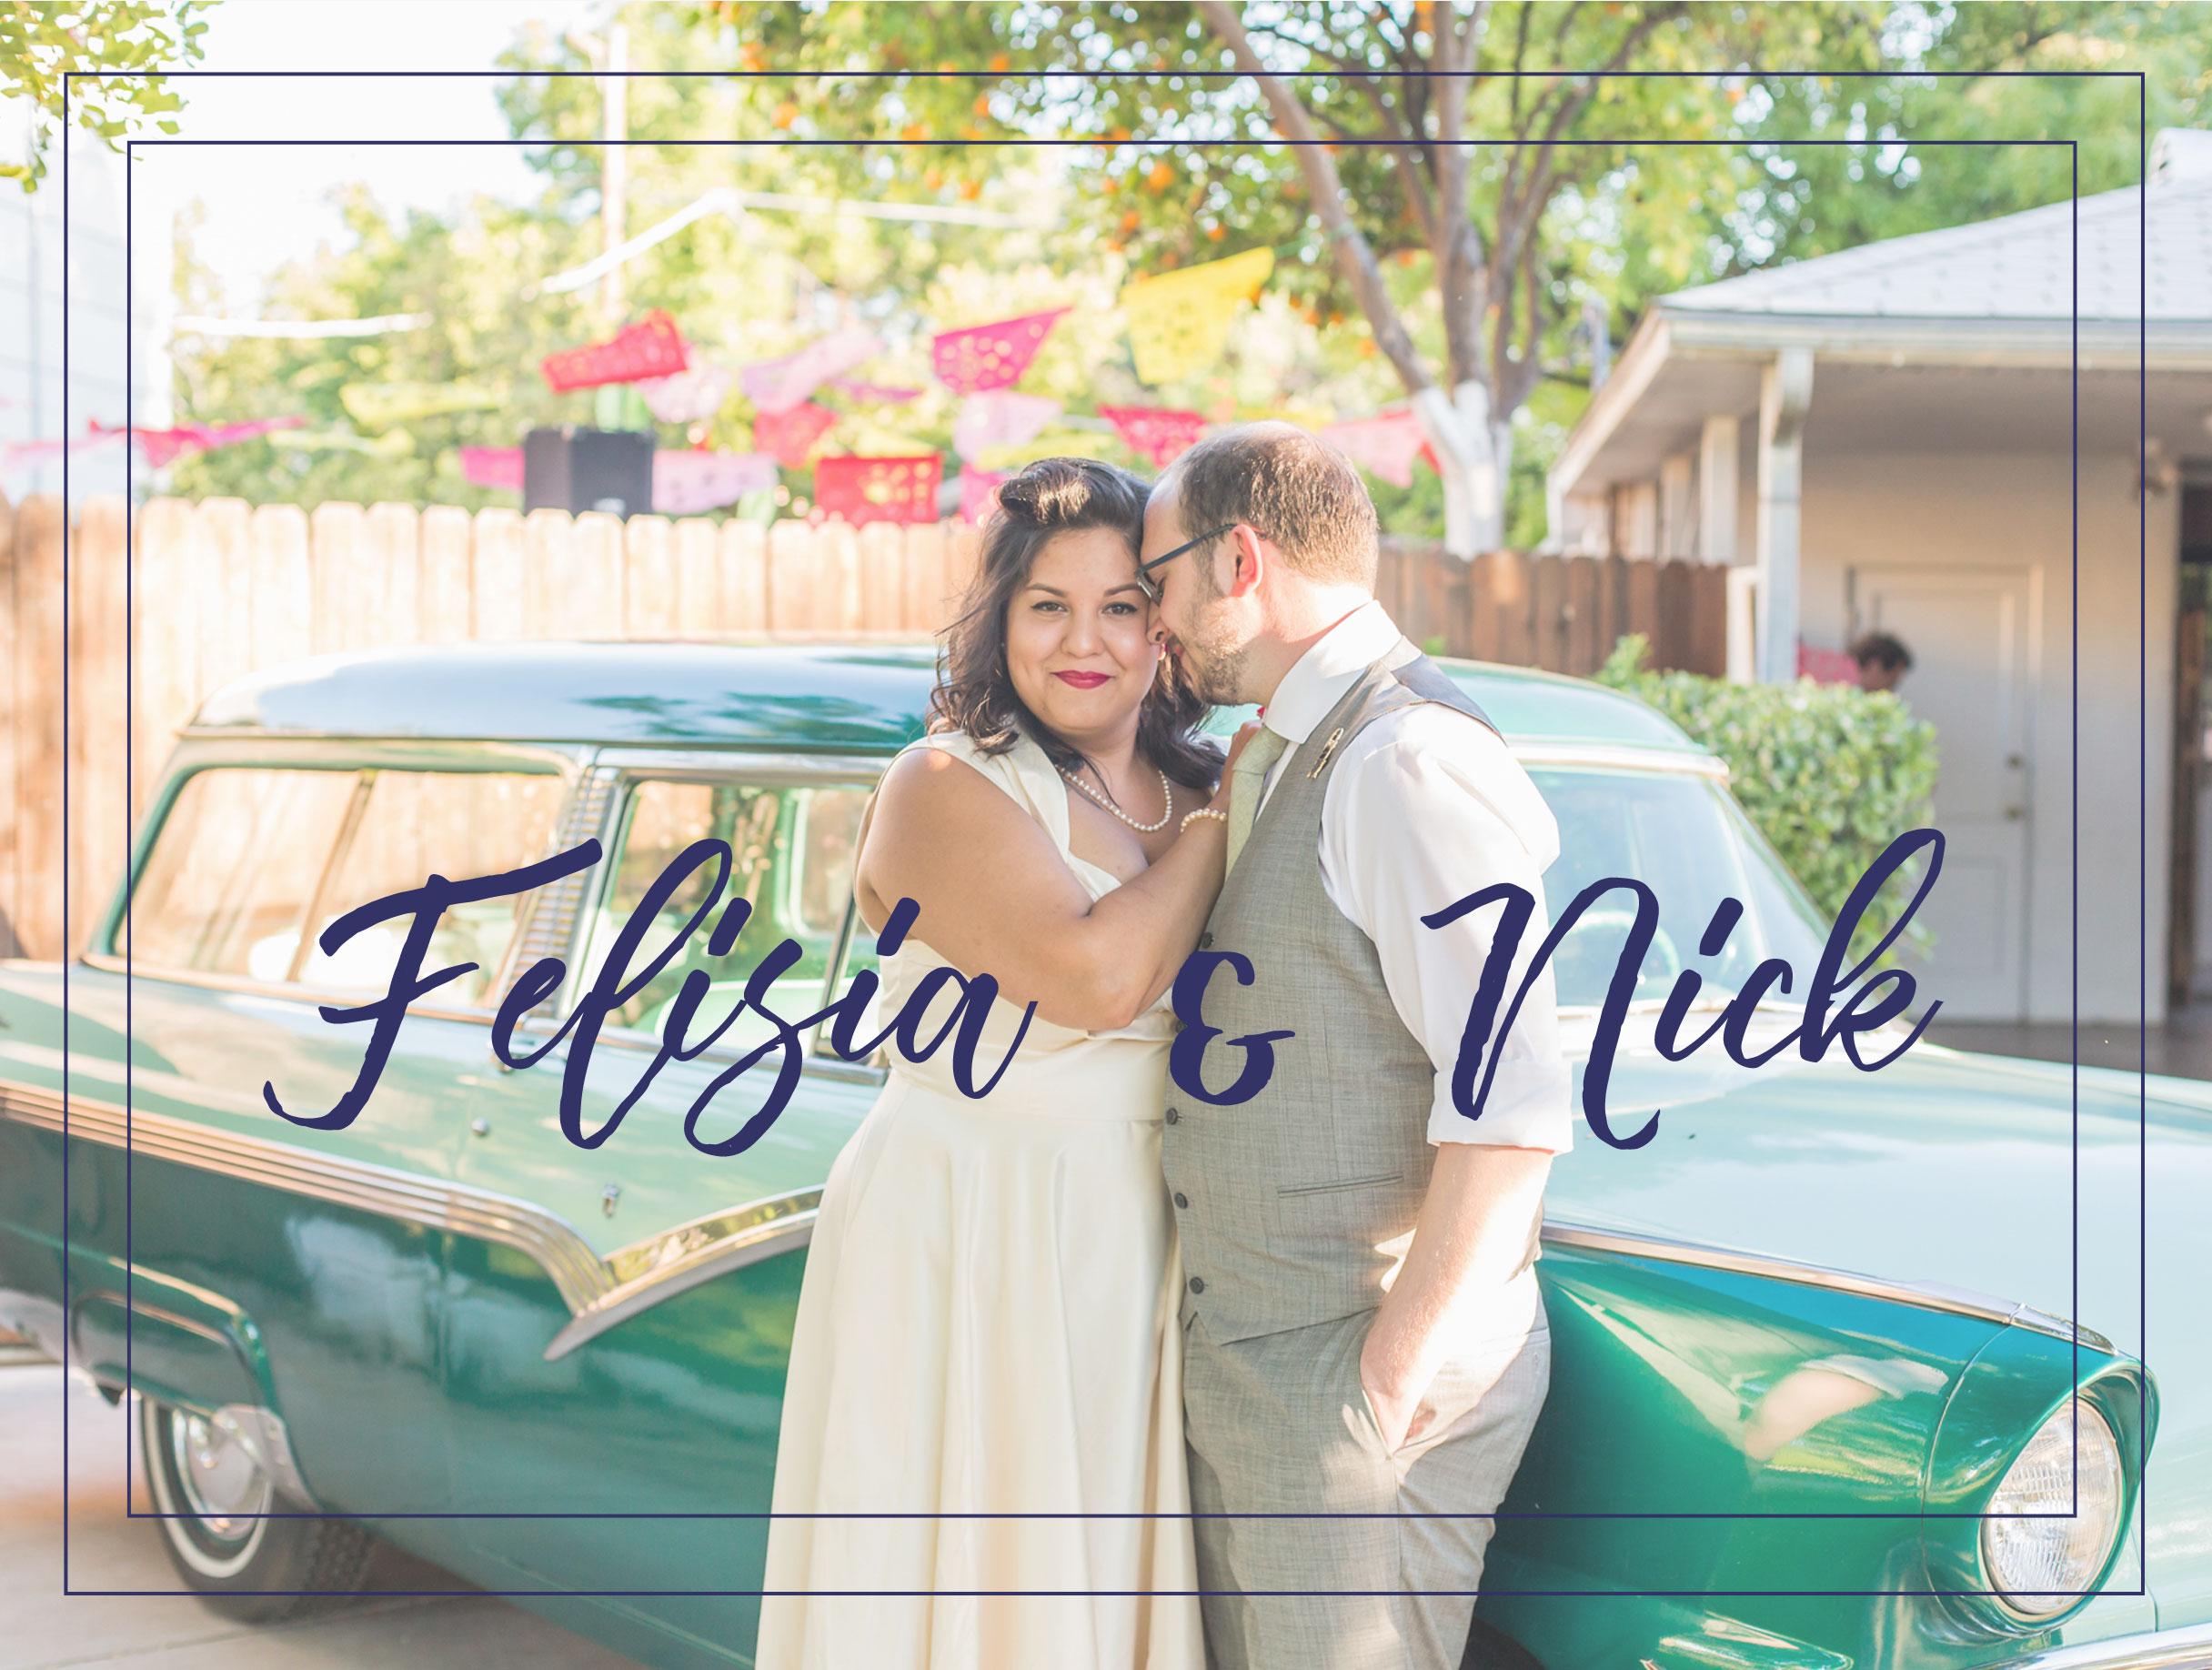 Teresa-Valencia-Photography-Phoenix-Backyard-Wedding-Felisia-And-Nick.jpg